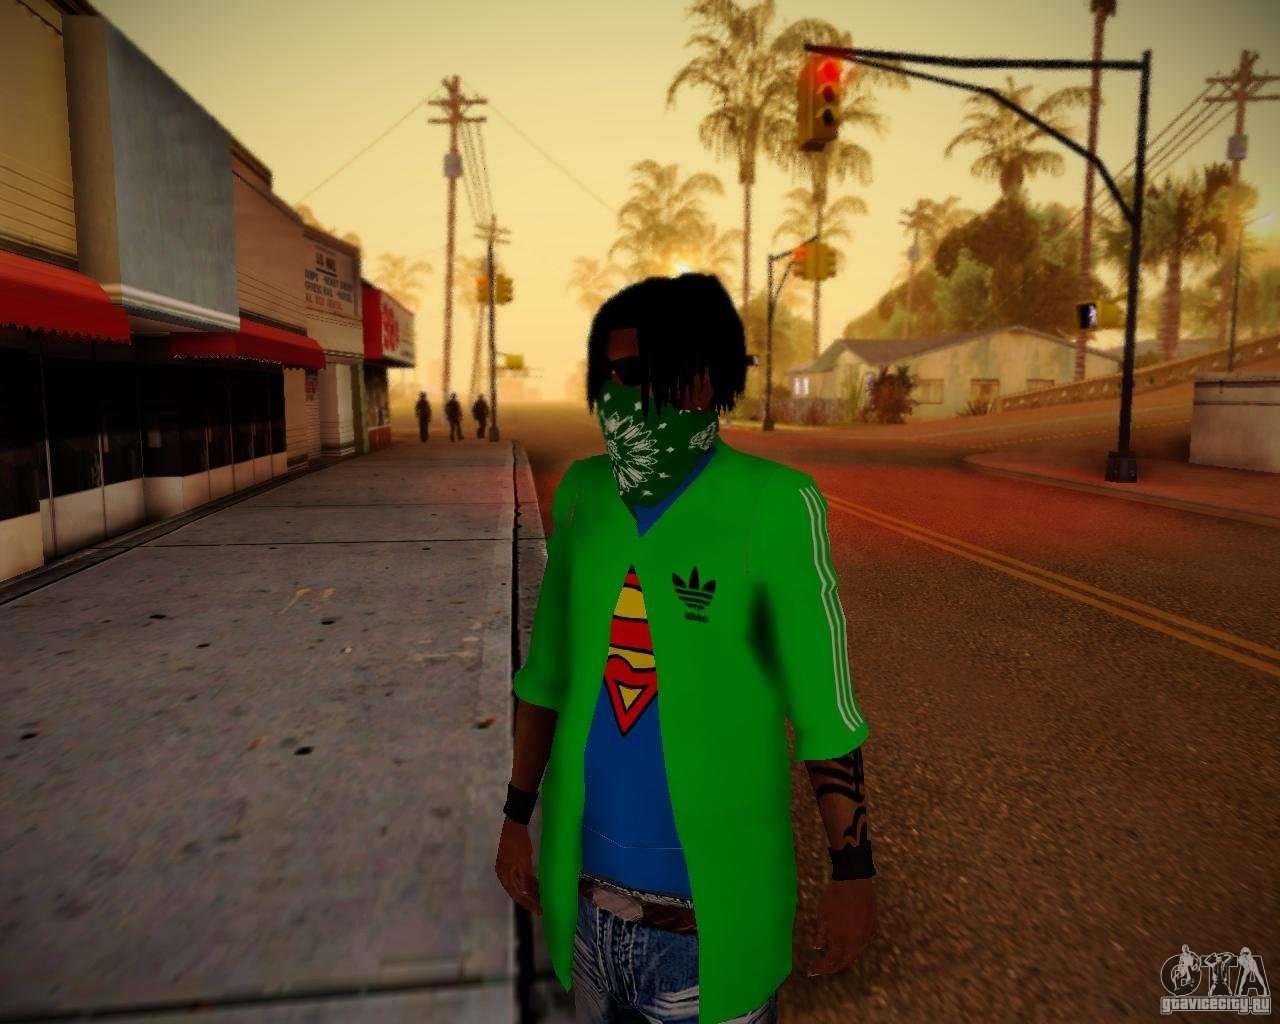 Crip Girl Wallpaper Skins Pack Gang Grove For Gta San Andreas